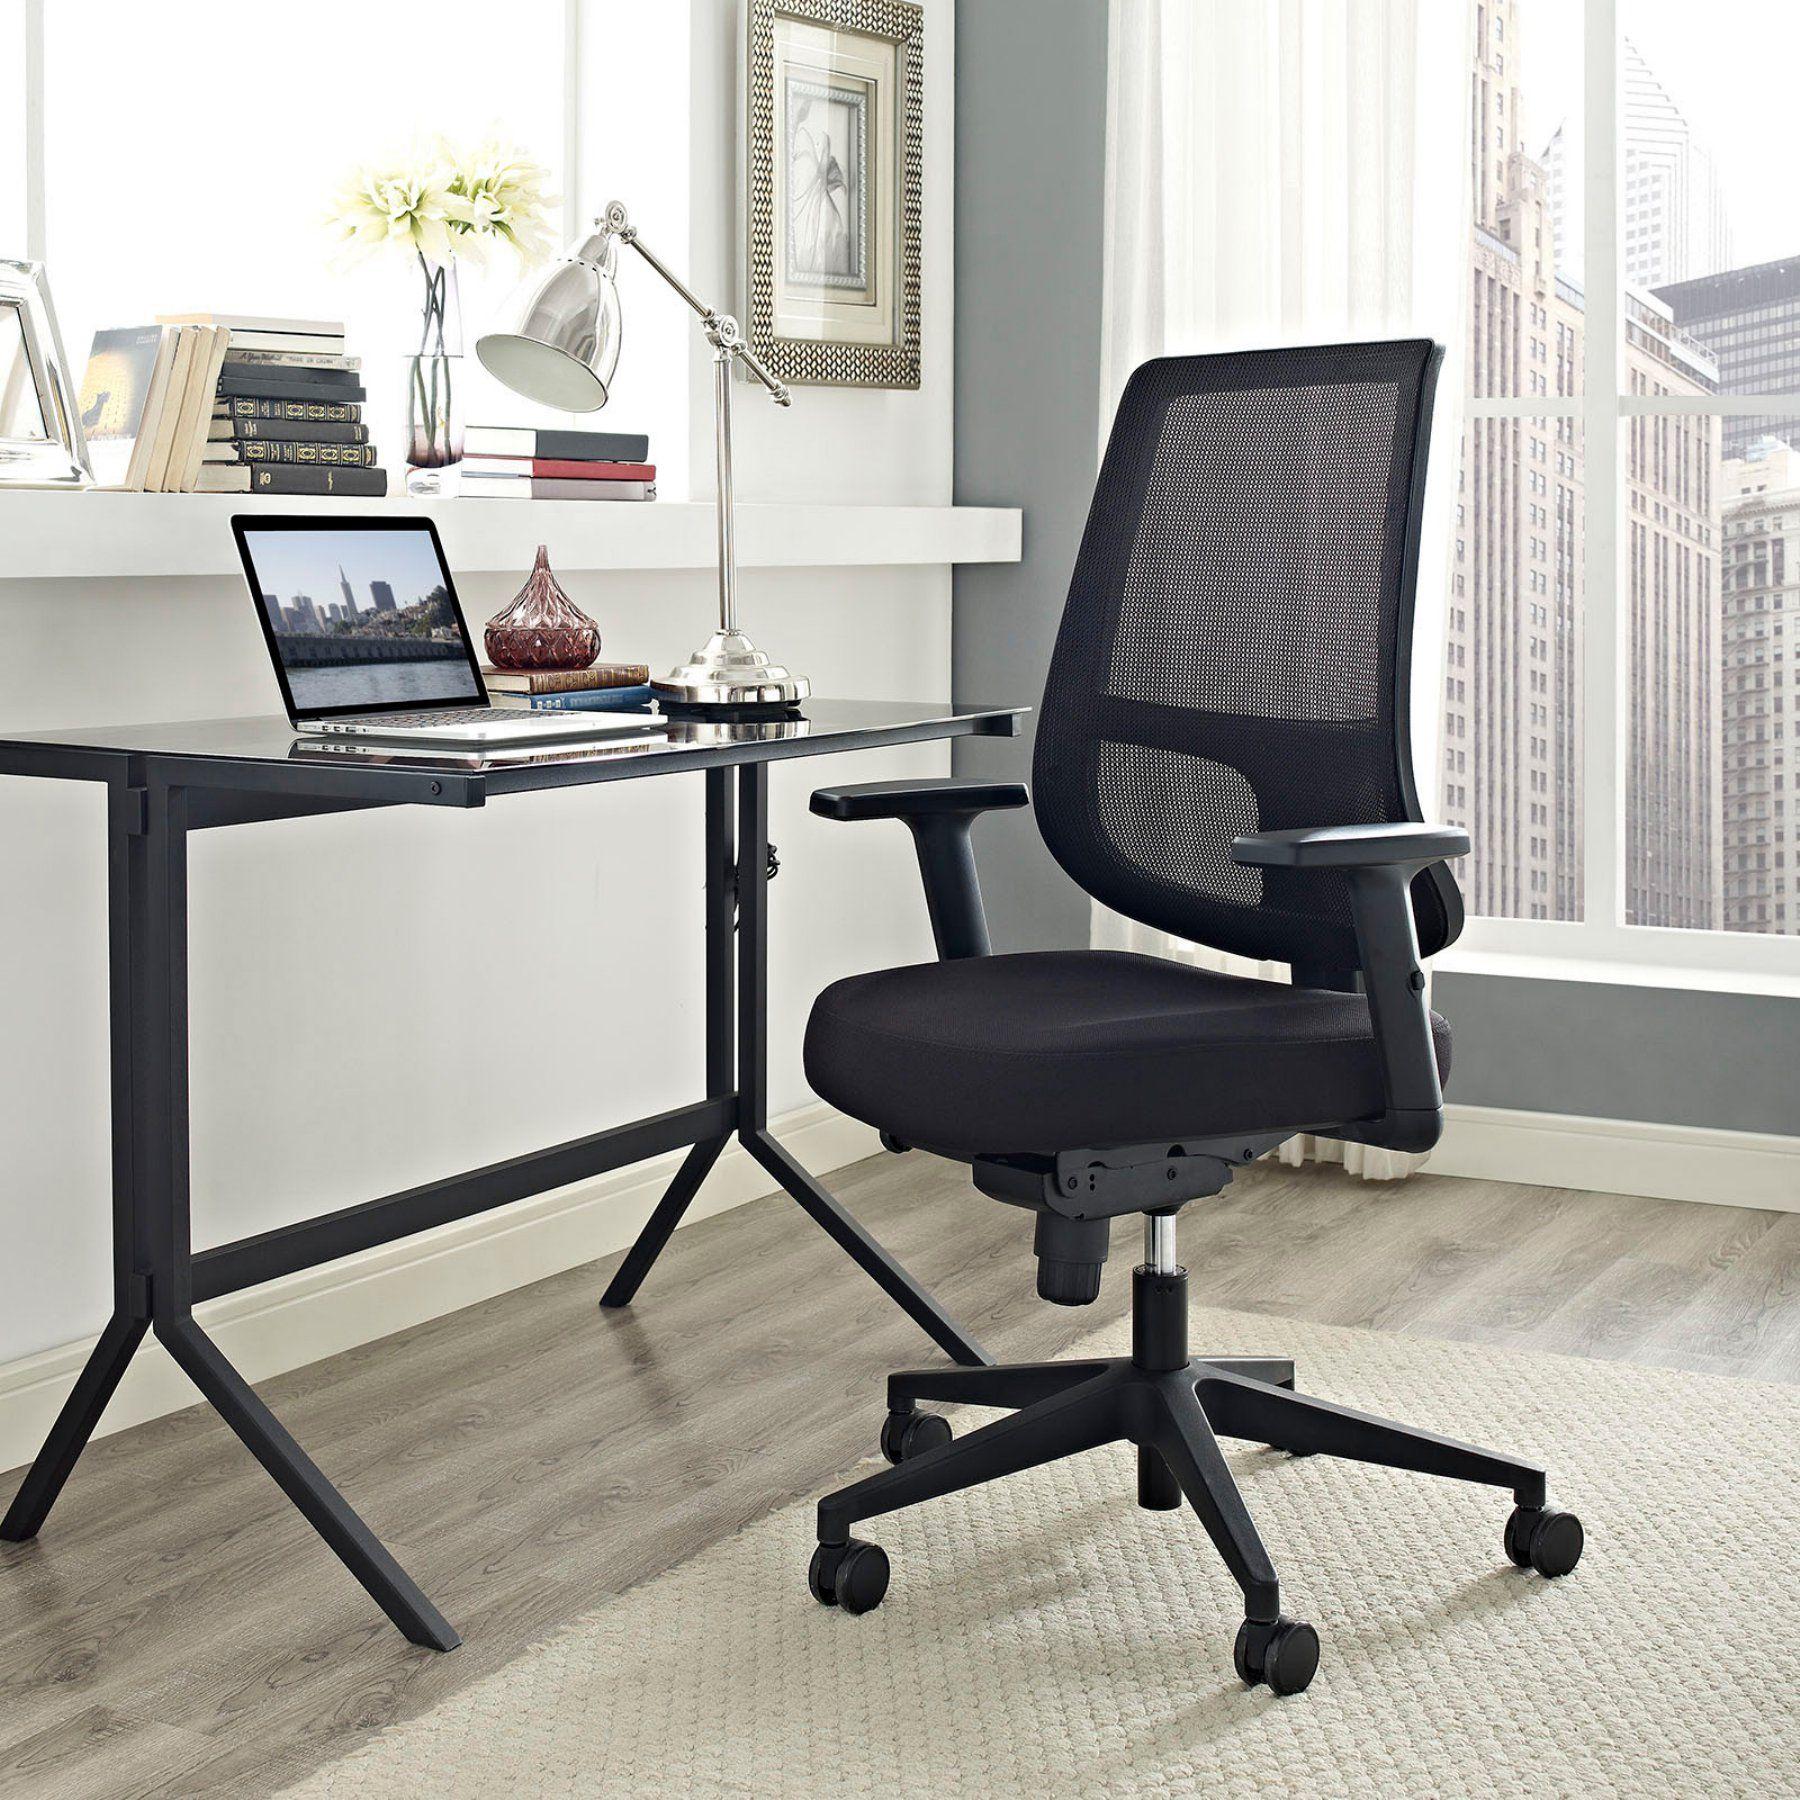 lexmod focus edge desk chair x1 modway pump office white products pinterest mesh eei 2215 blk